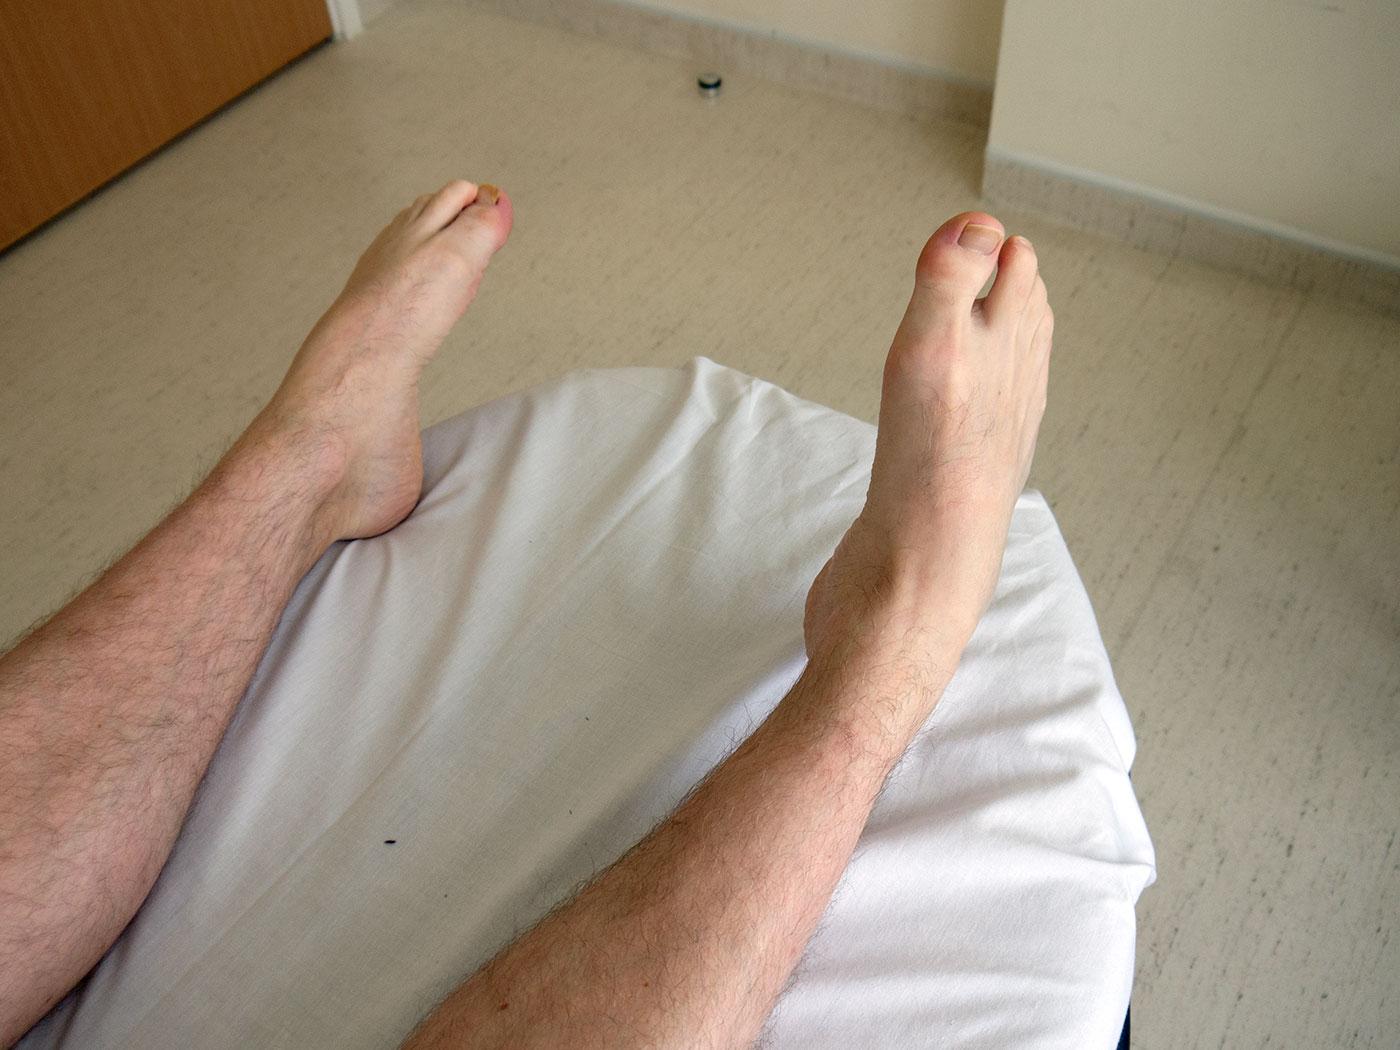 Foot inversion movement